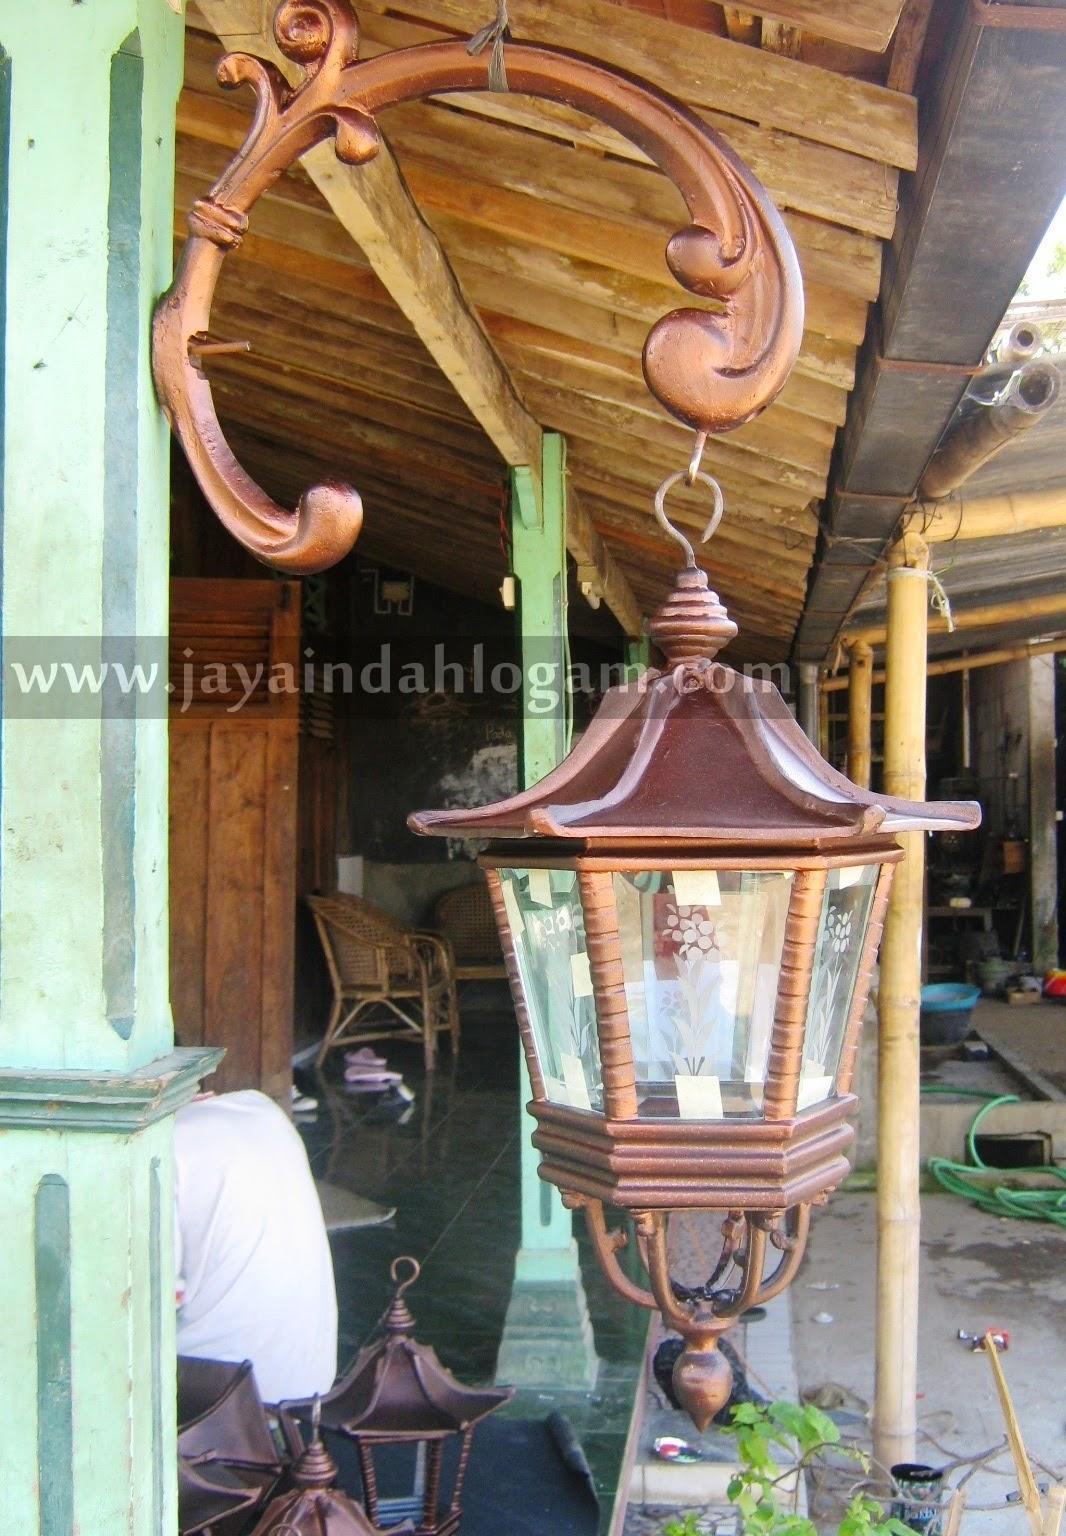 http://www.jayaindahlogam.com/2014/08/kerajinan-lampu-dinding.html